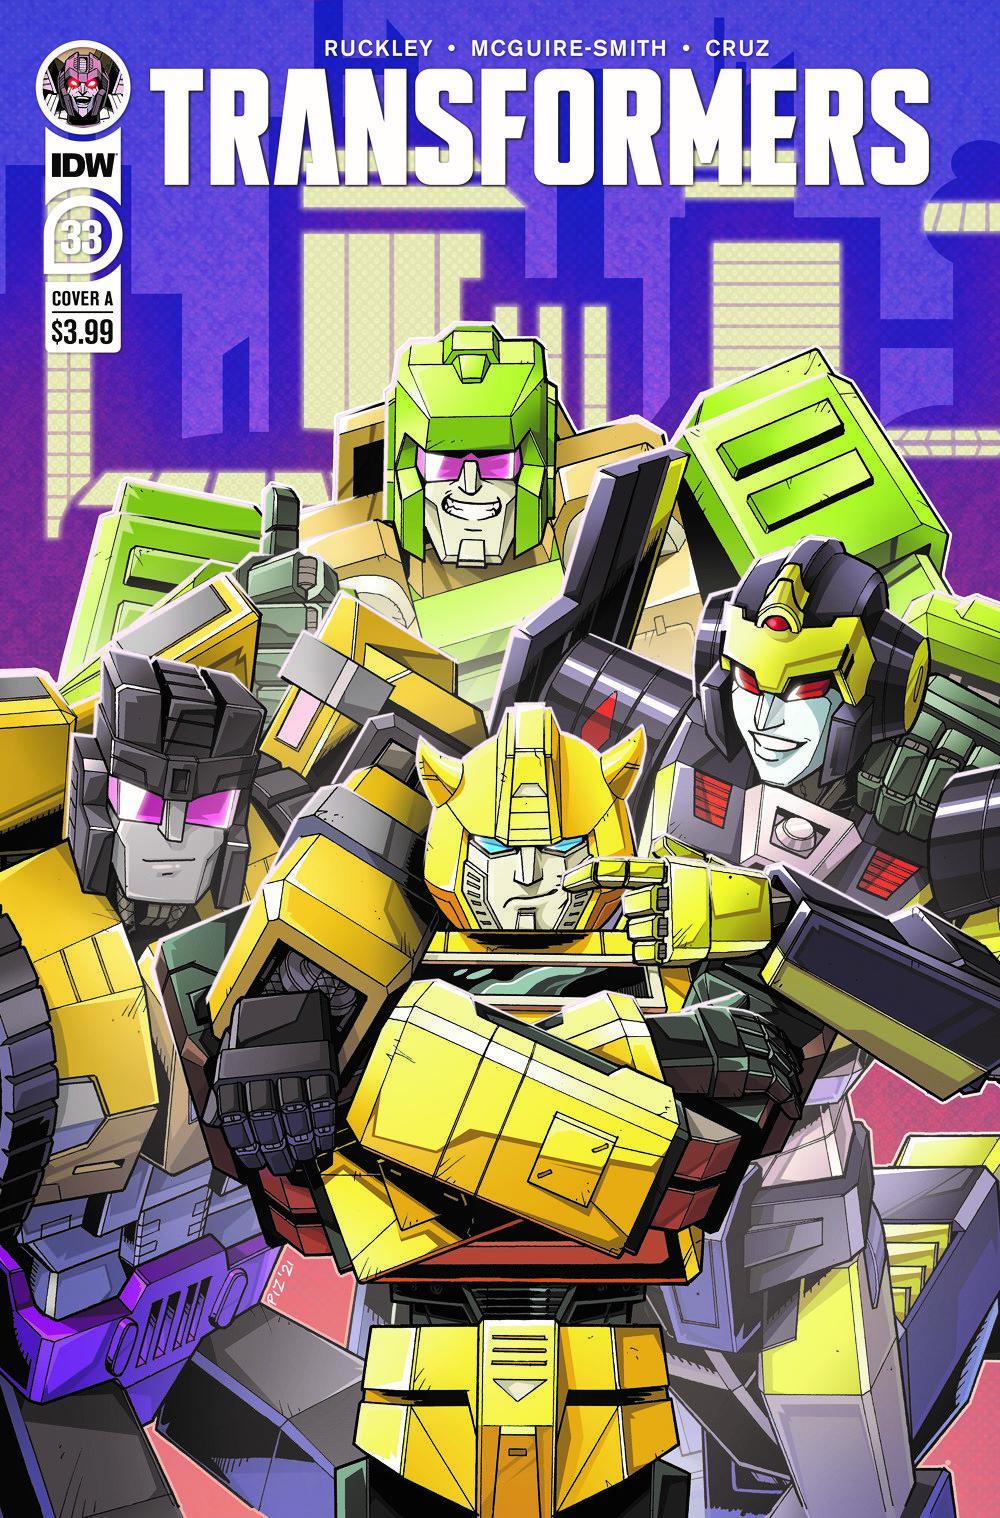 TF33-cvr-A ComicList Previews: TRANSFORMERS #33